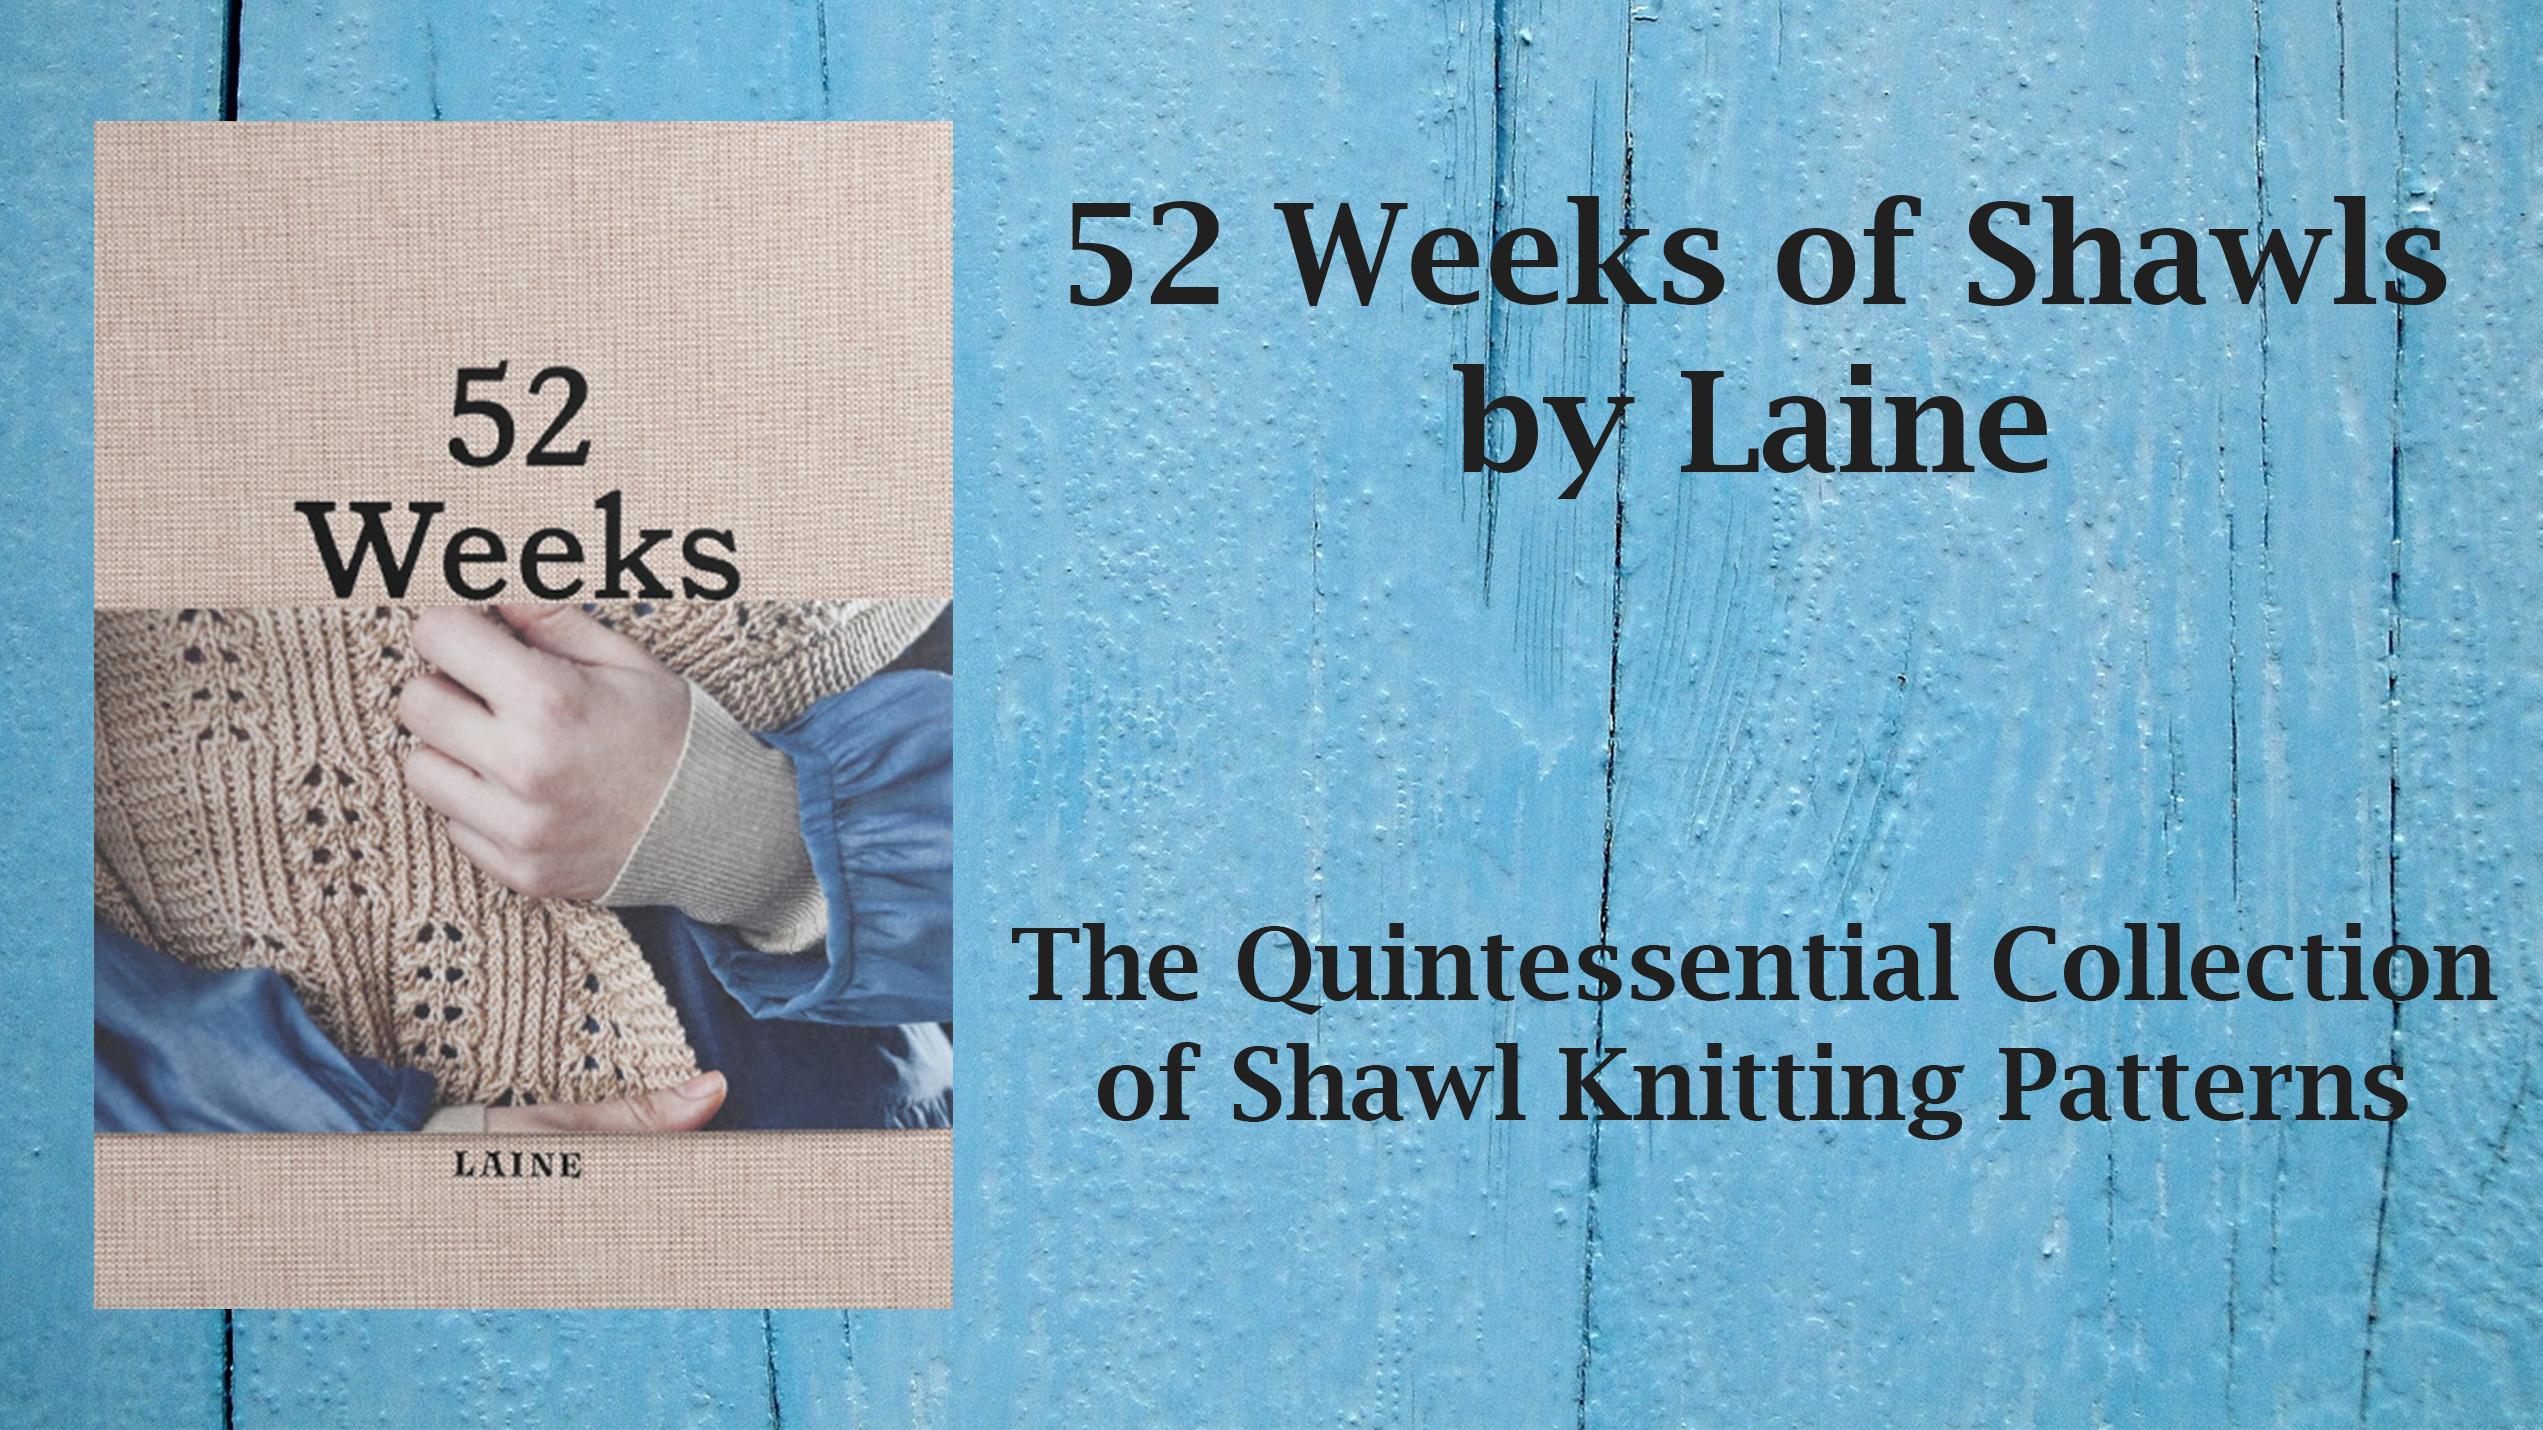 Image of 52 Weeks of Shawls